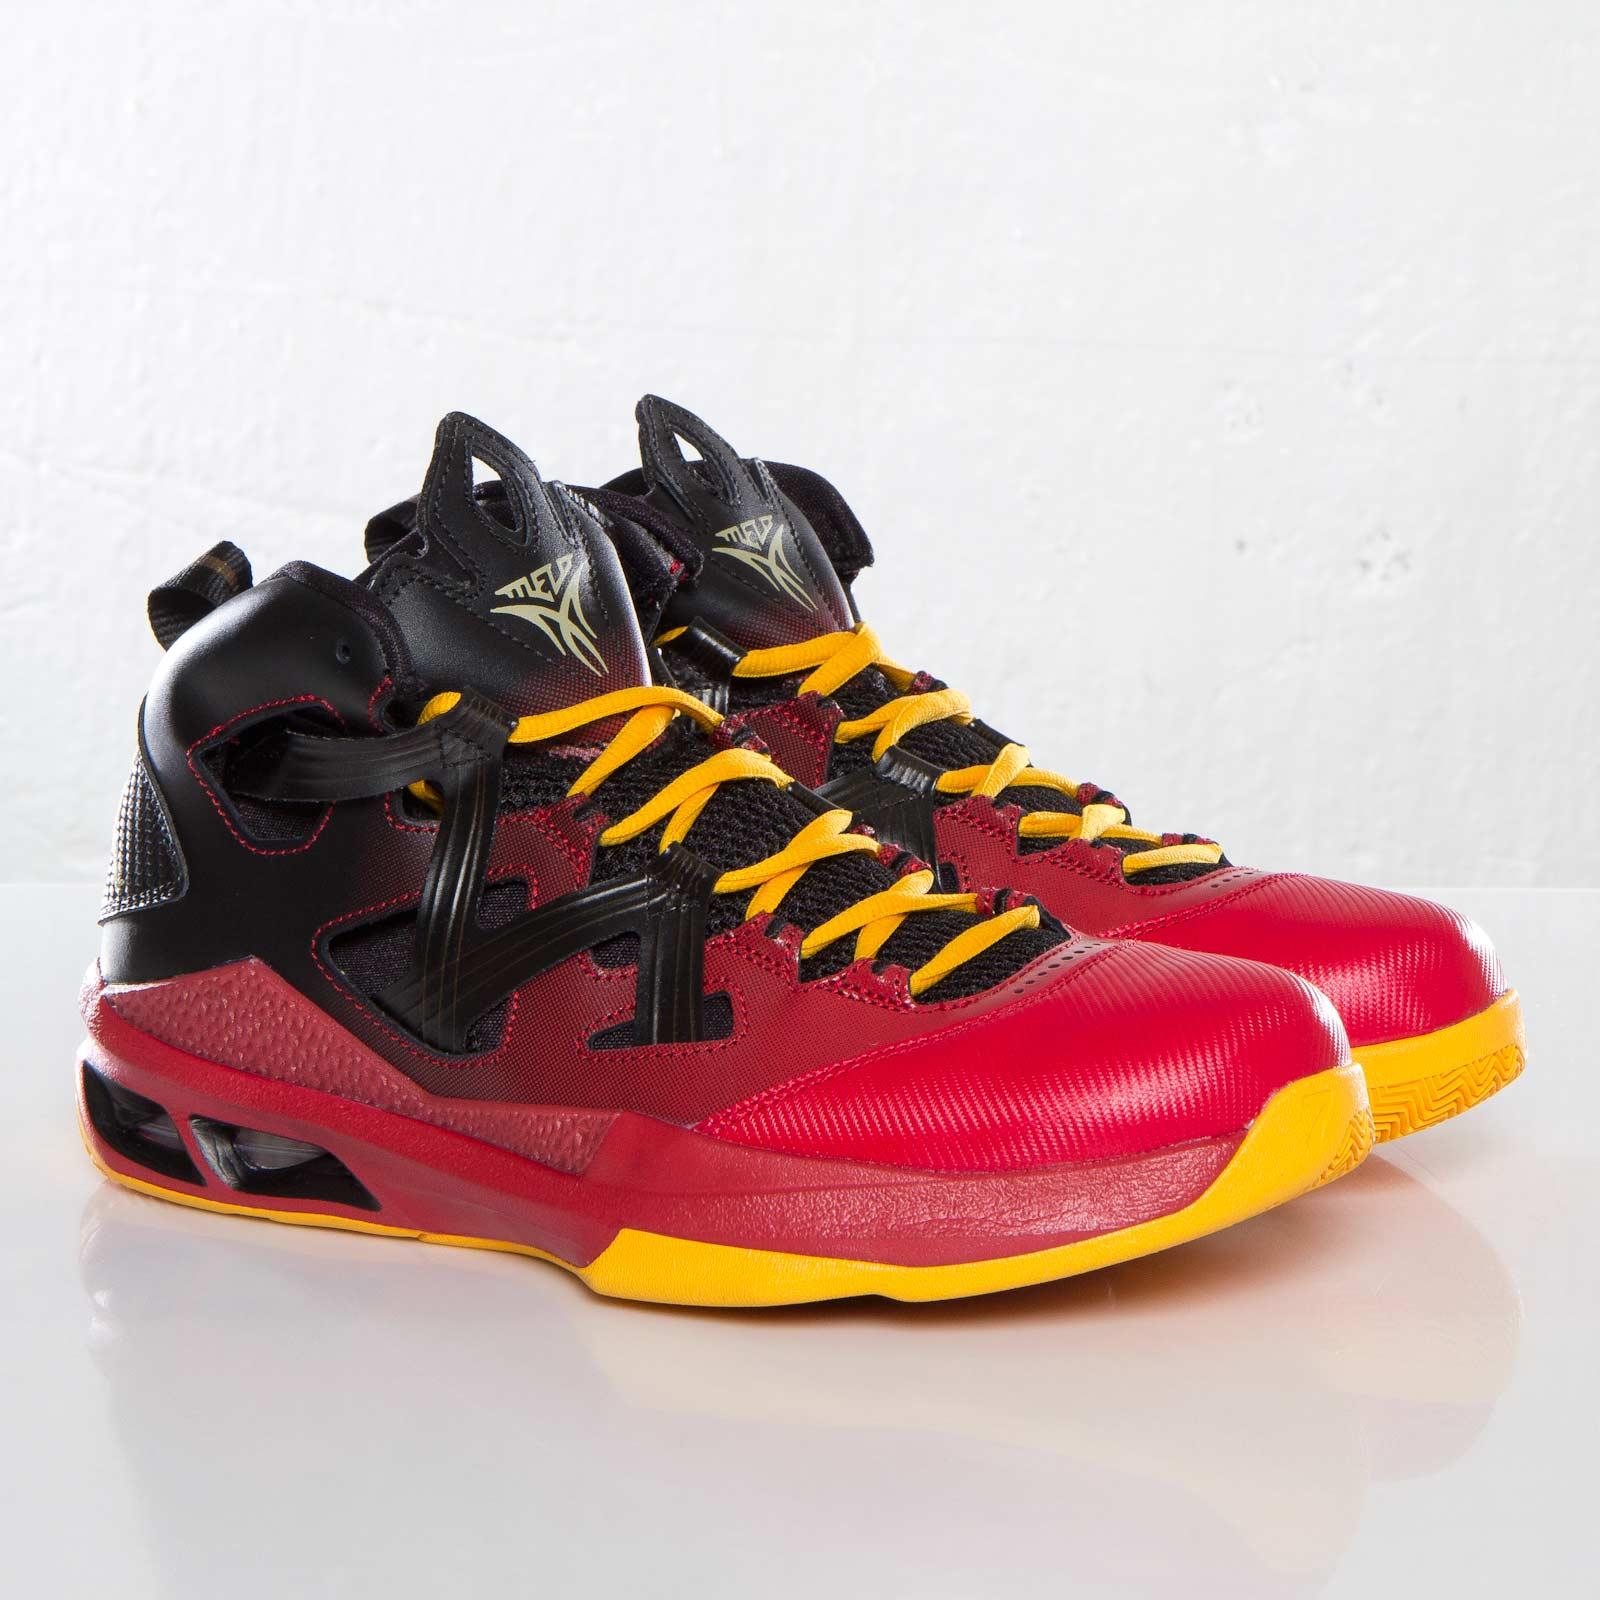 5fc953326ef72b Jordan Brand Jordan Melo M9 - 551879-028 - Sneakersnstuff